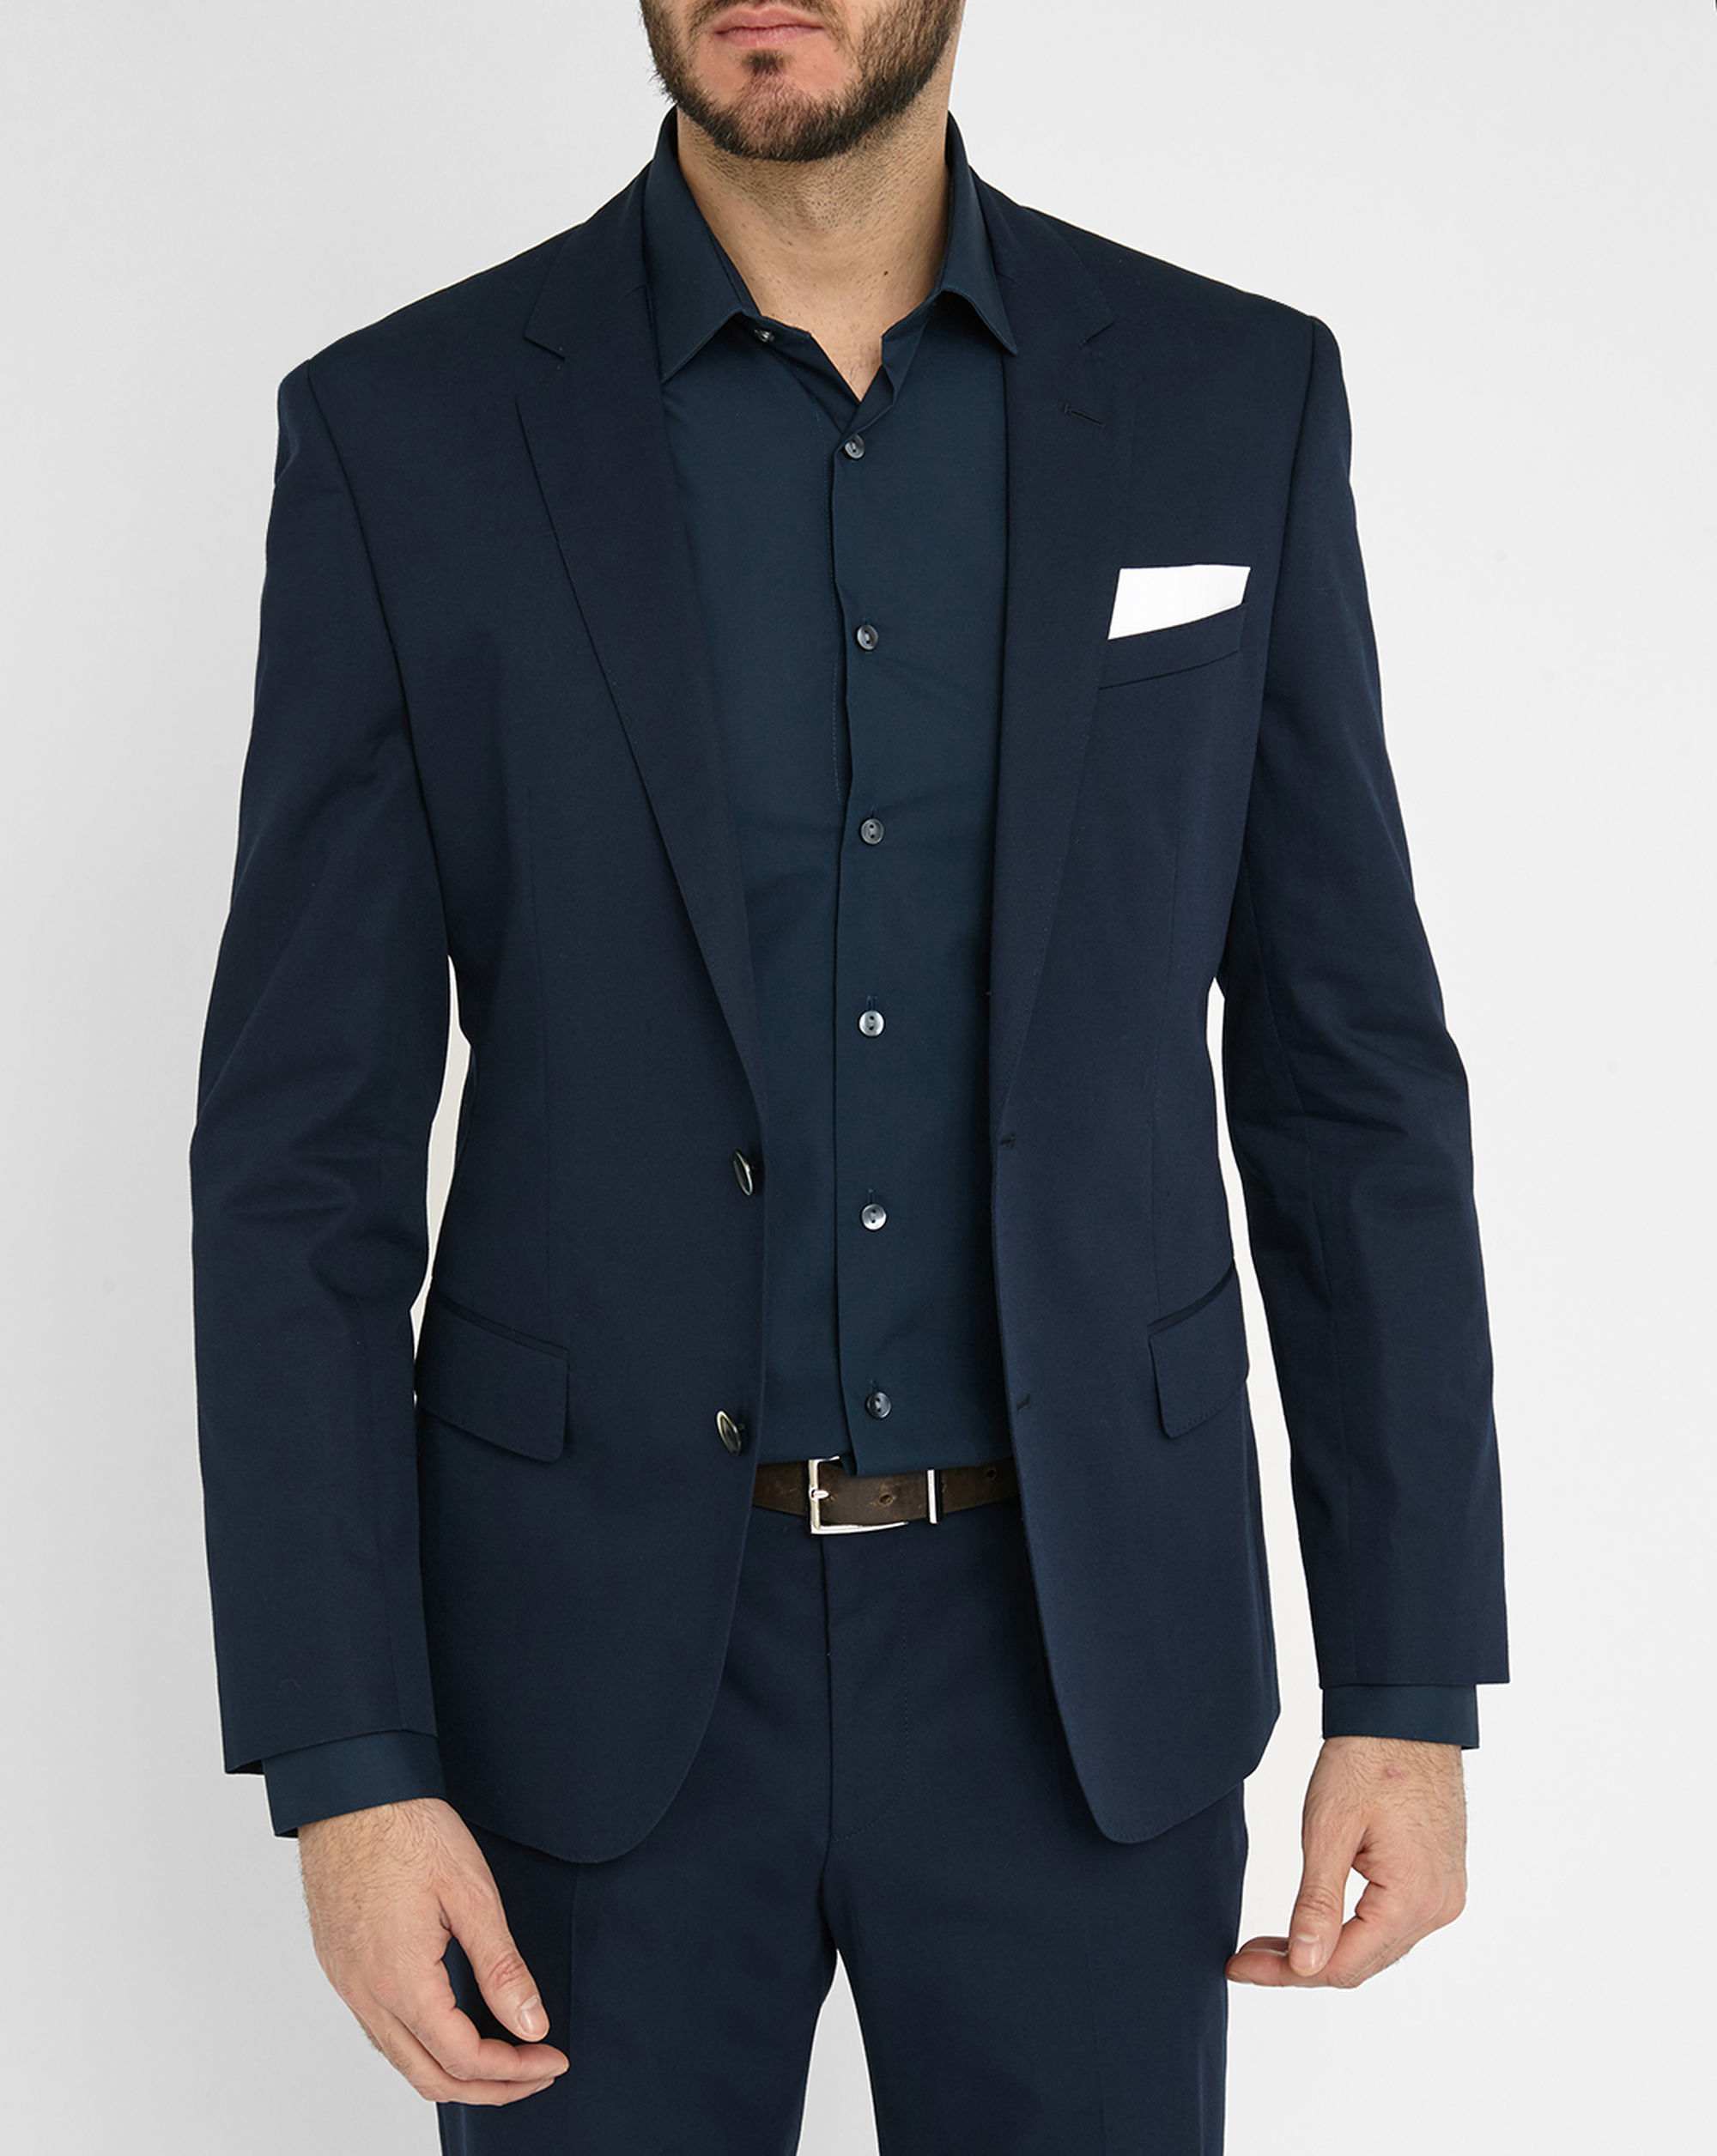 hugo blue hutson fitted cotton suit in blue for men lyst. Black Bedroom Furniture Sets. Home Design Ideas